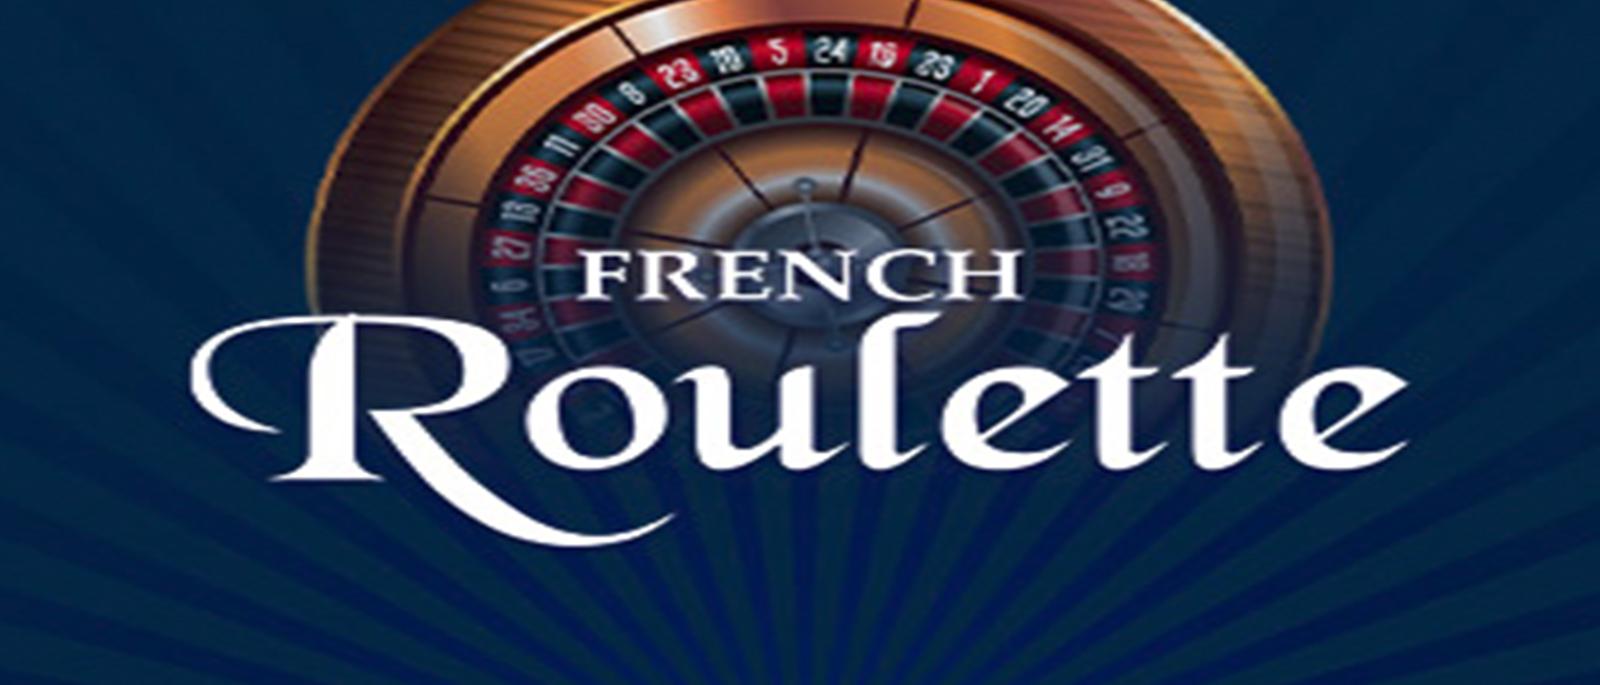 French Roulette Netent Spiel